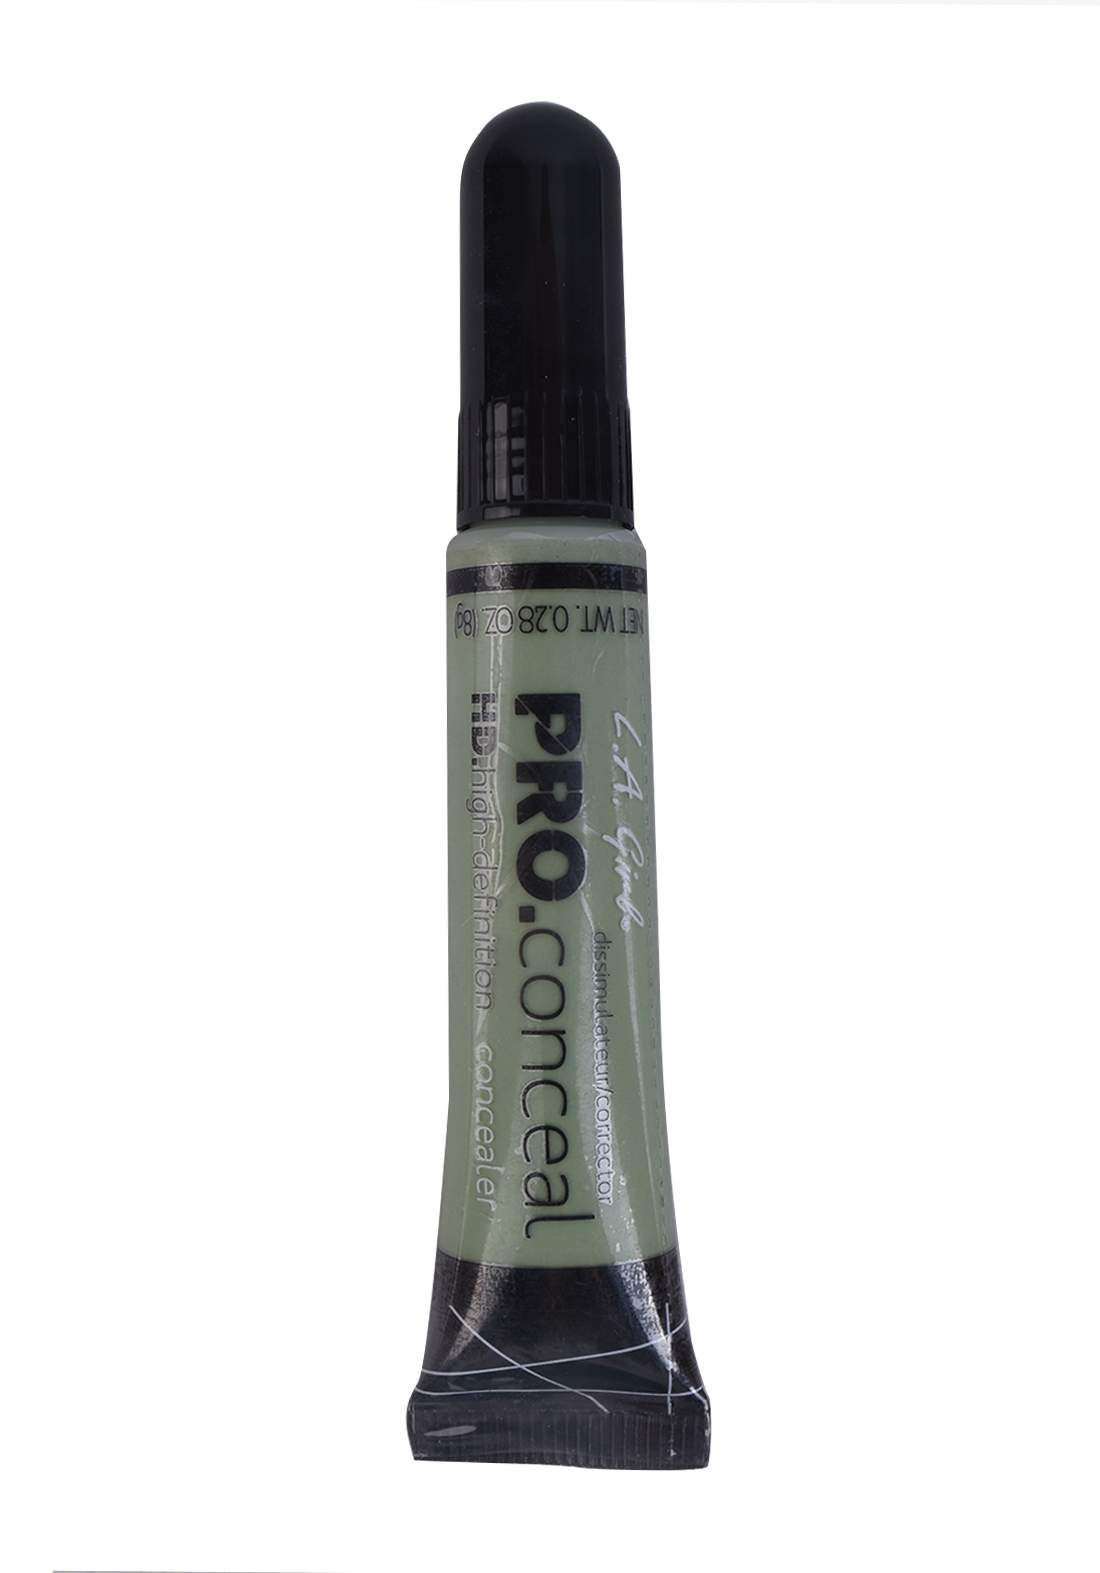 L.A. Girl - Liquid Concealer Pro Concealer HD High-Definition No.GC992 Greenكونسيلر